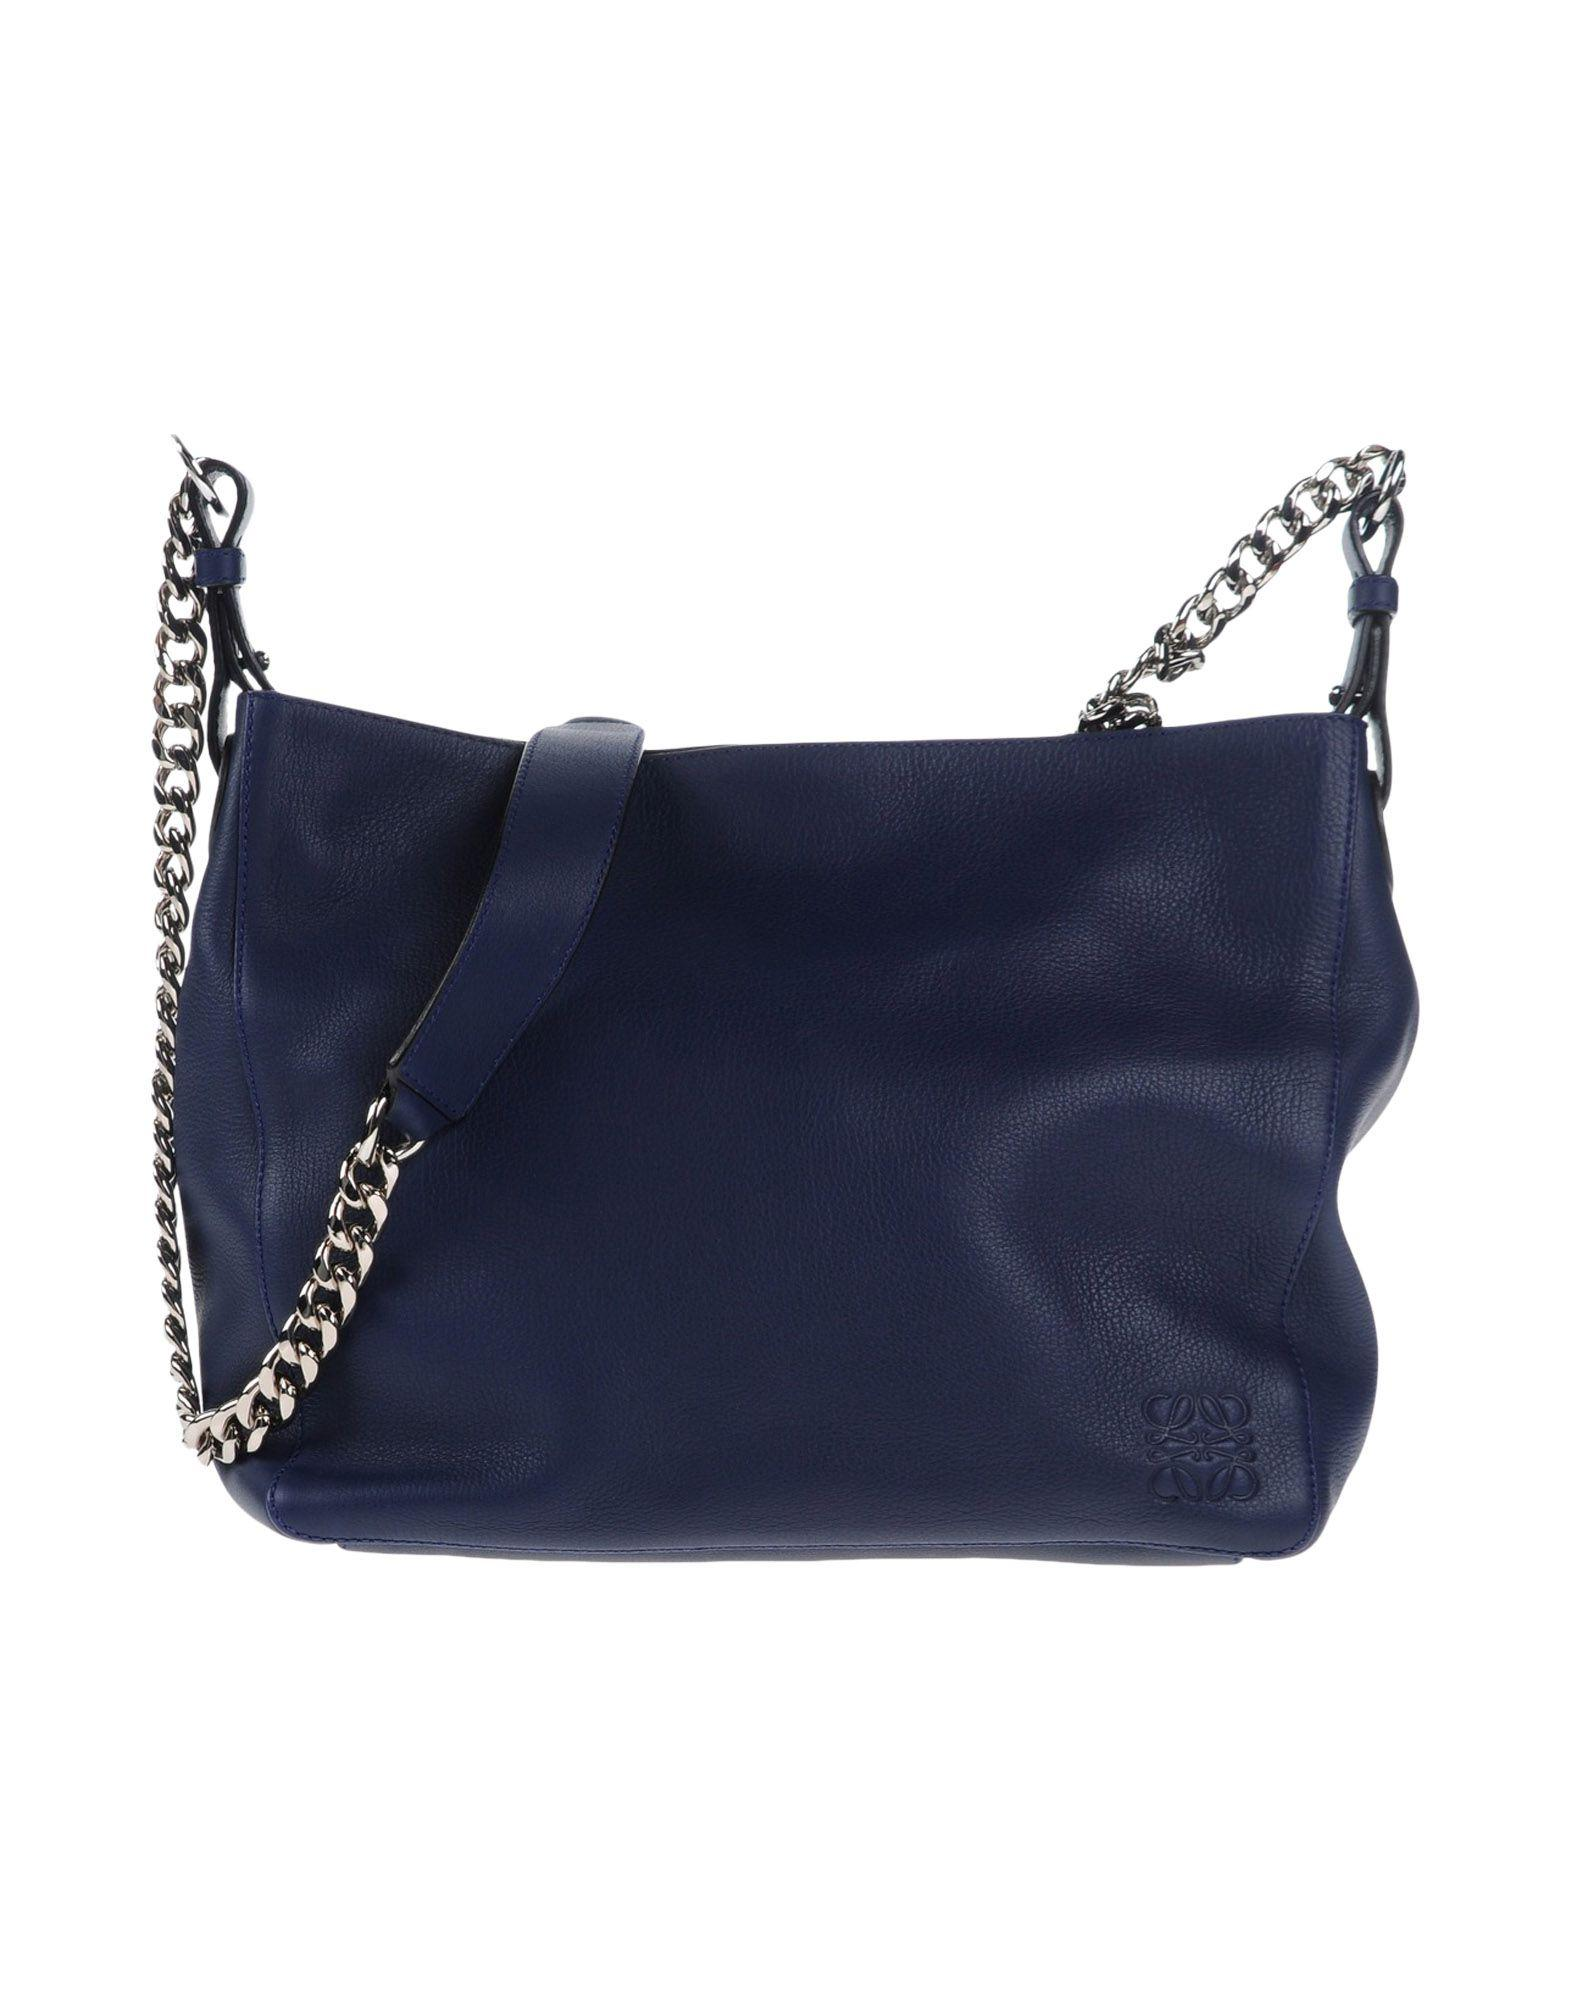 6db5a5293451 Lyst - Loewe Cross-body Bag in Blue